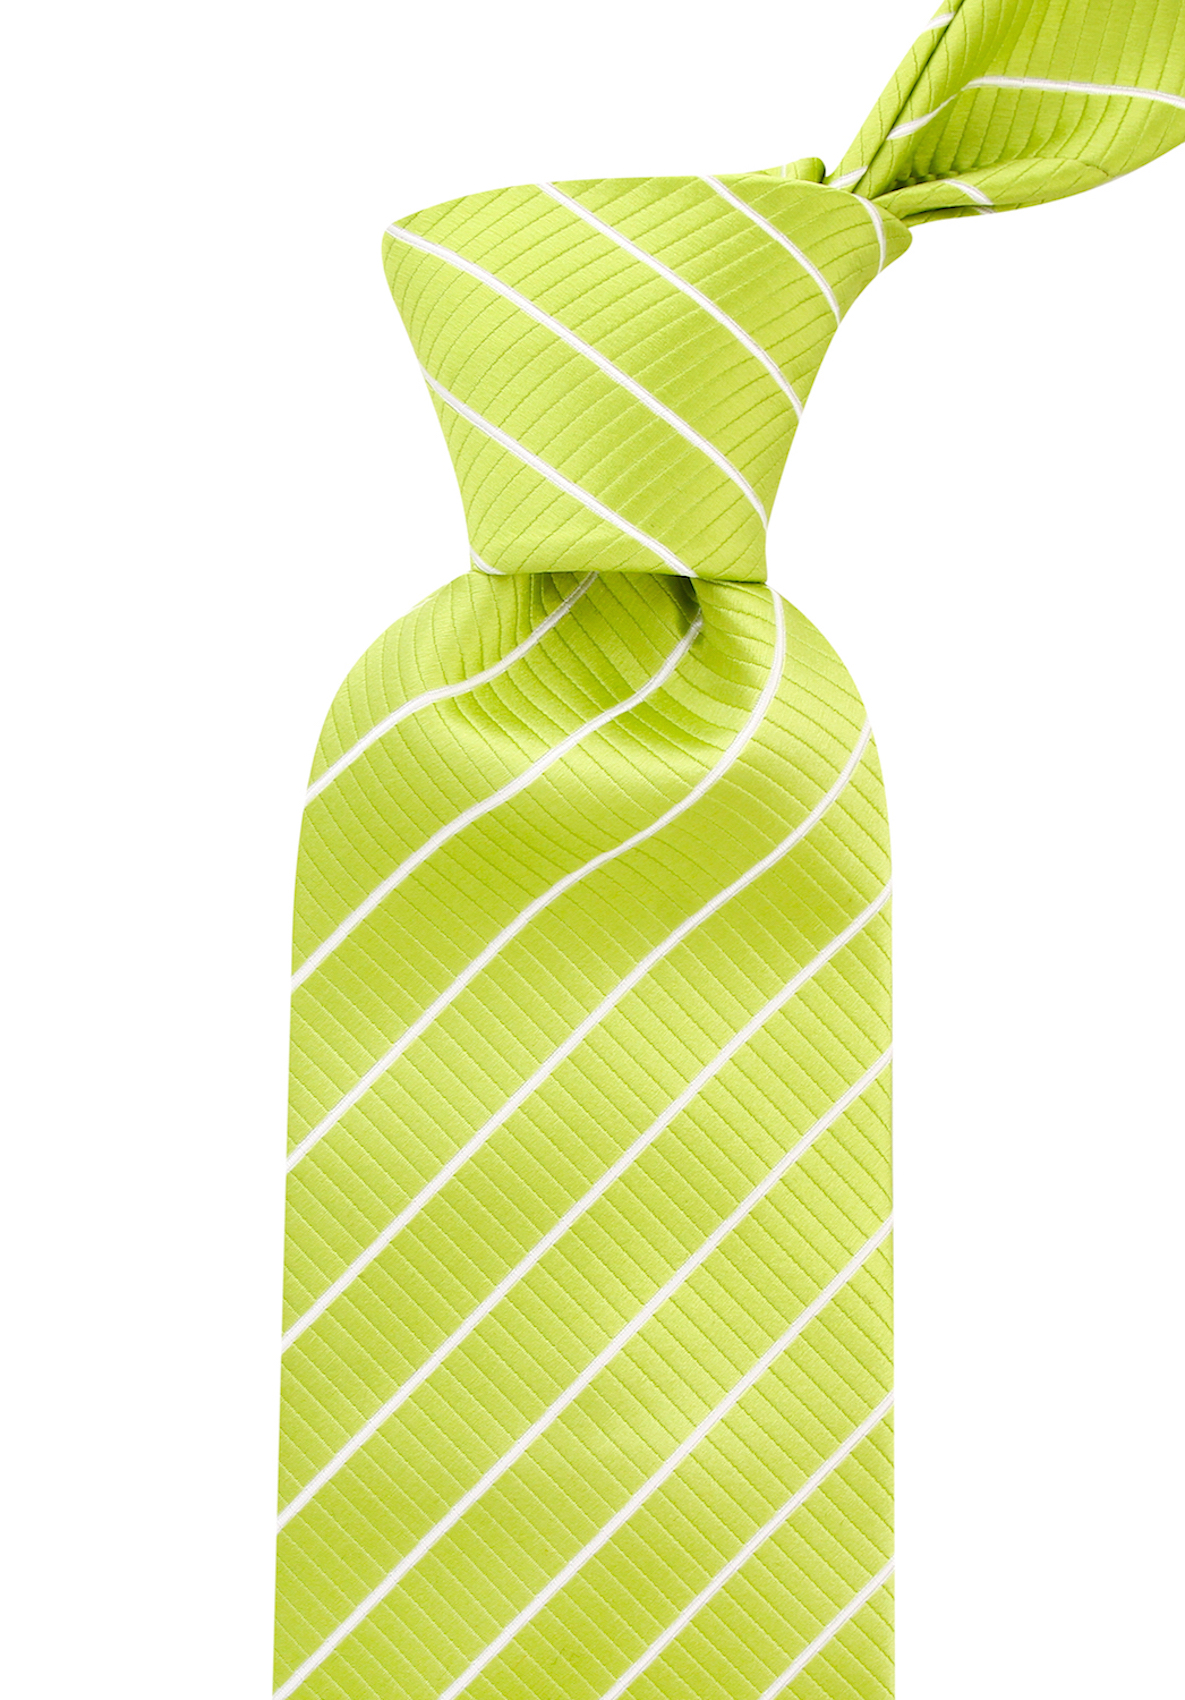 Scott-Allan-Mens-Striped-Tie thumbnail 14